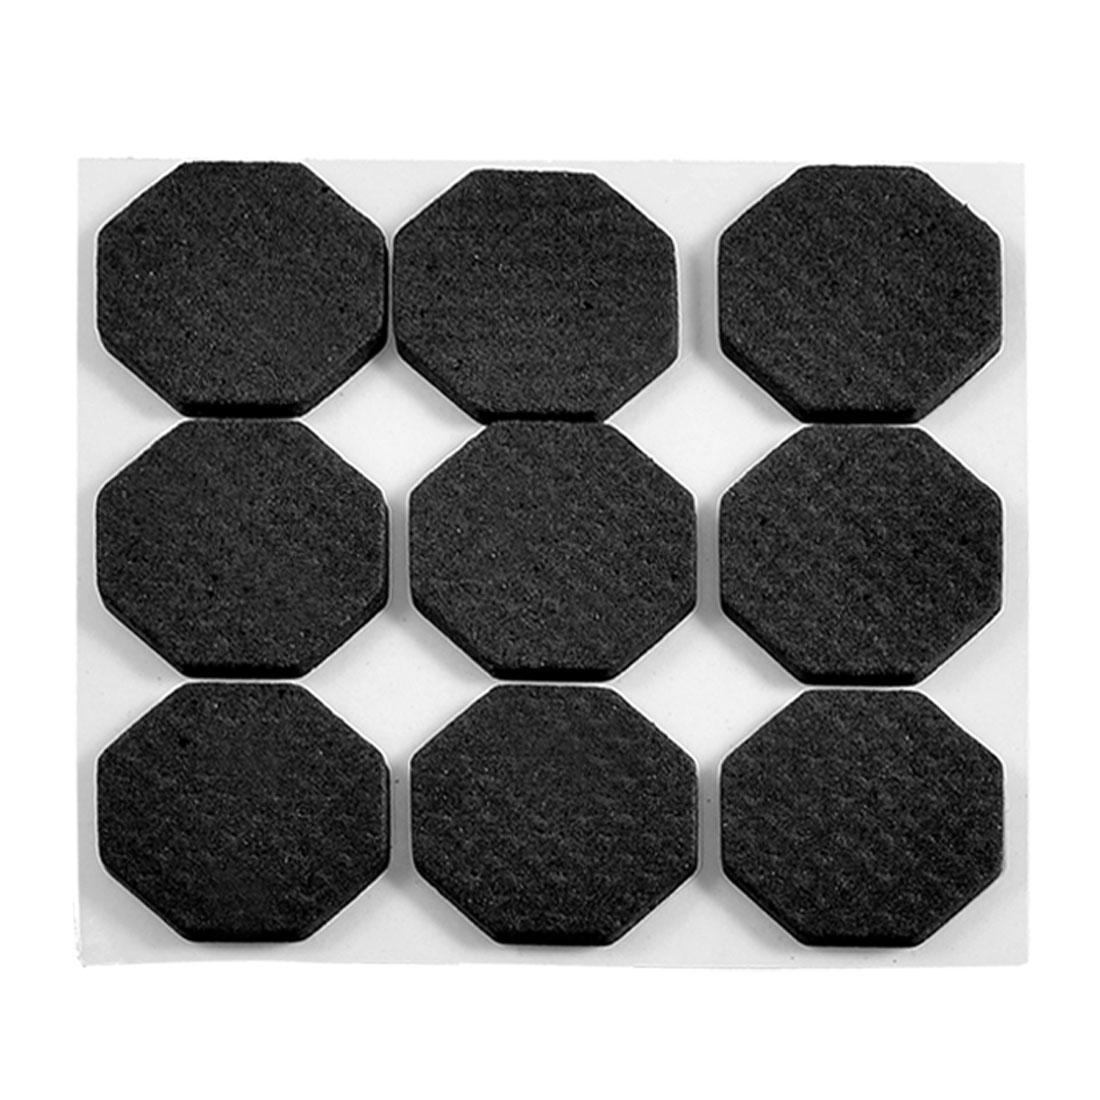 Self-adhesive Hexagon Black Furniture Protection Cushion Pads Mat 9 Pcs